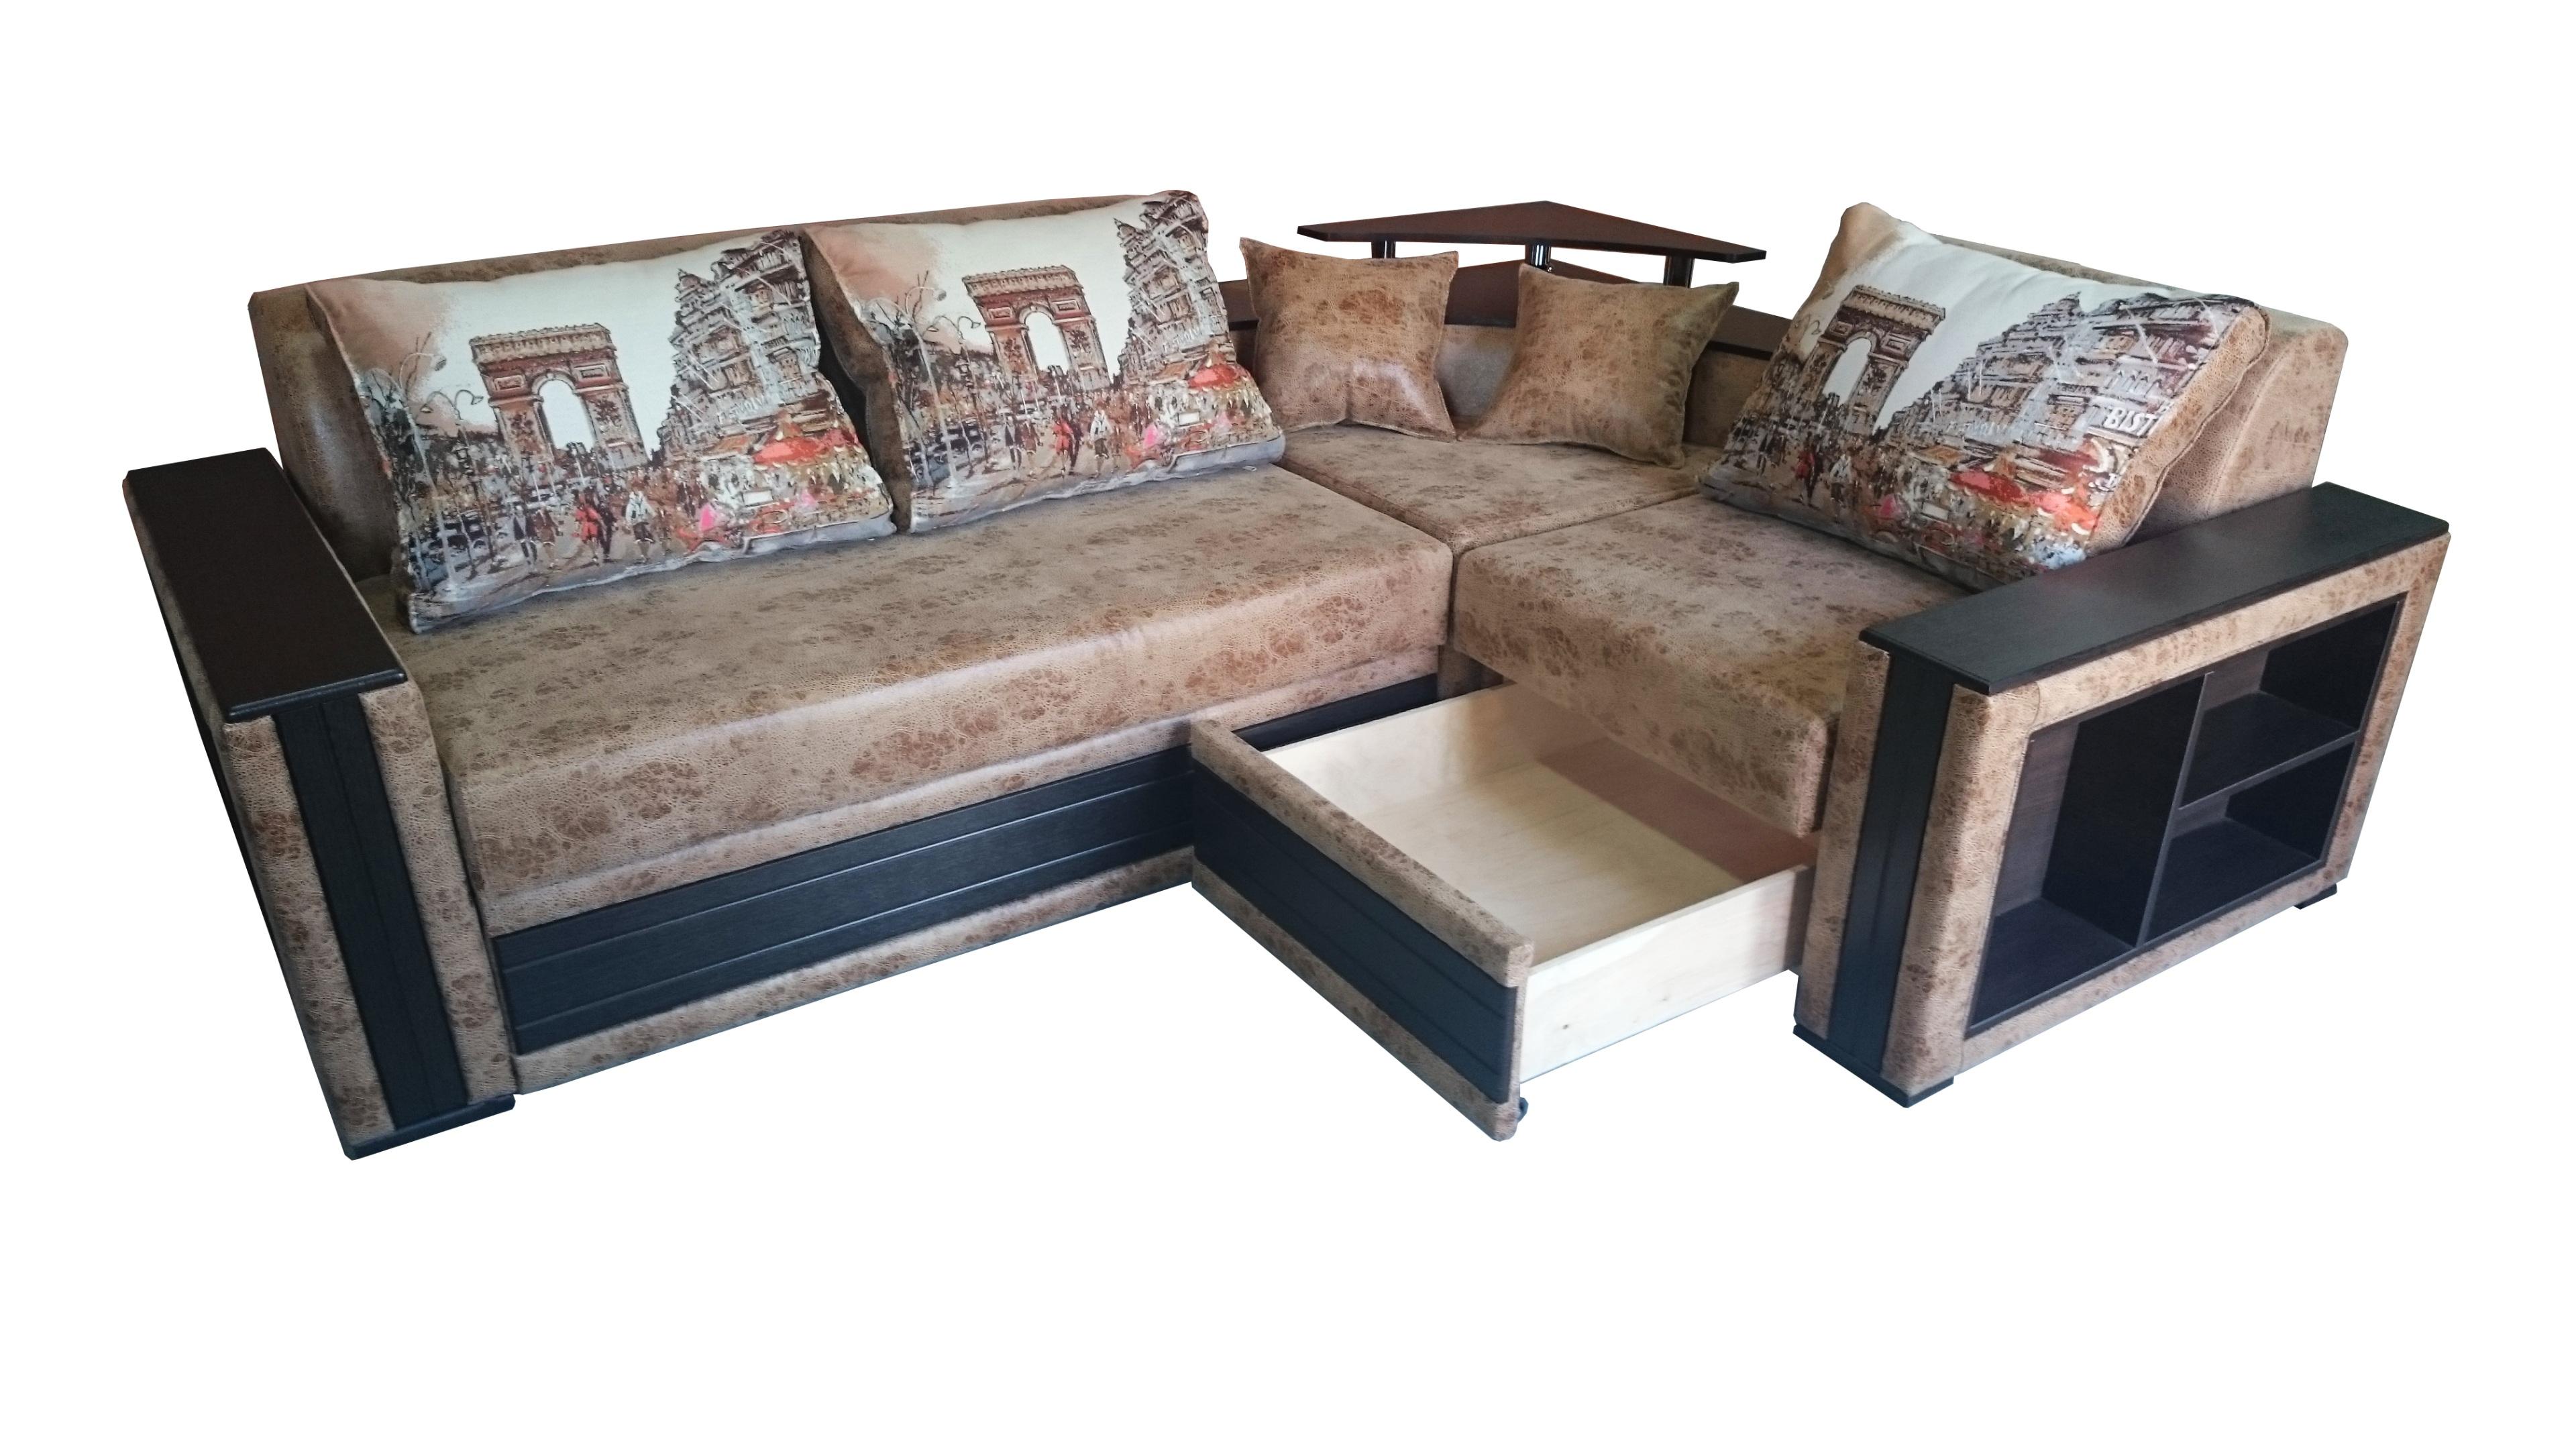 Fotos gratis : mesa, interior, foto, bar, marrón, sala, caja, mueble ...